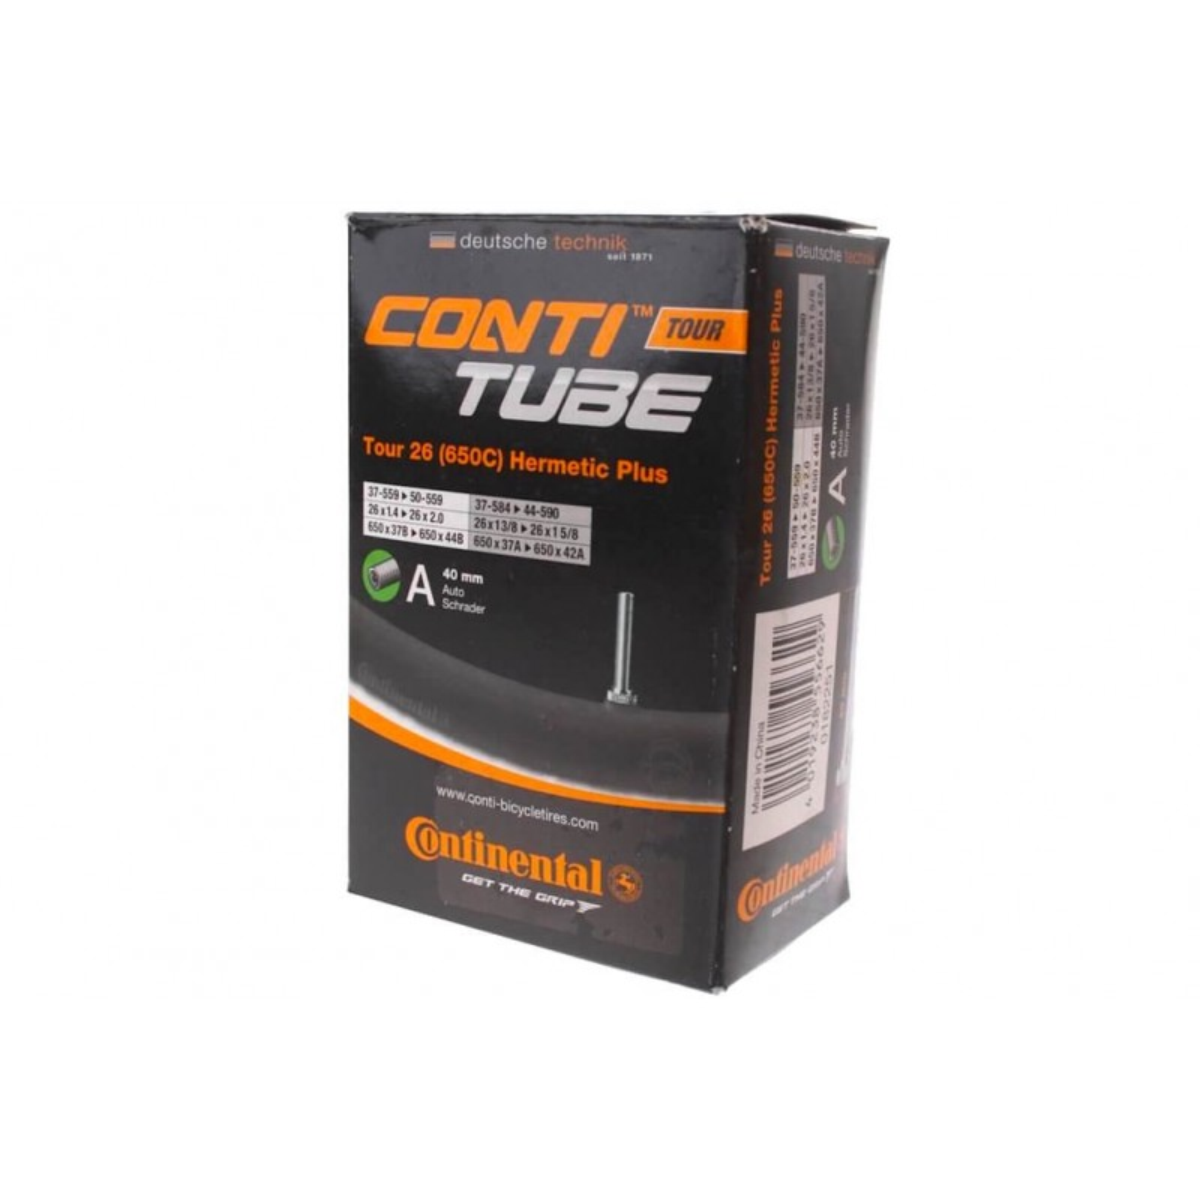 Conti Tube Tour 26 Hermetic Plus CO0182251